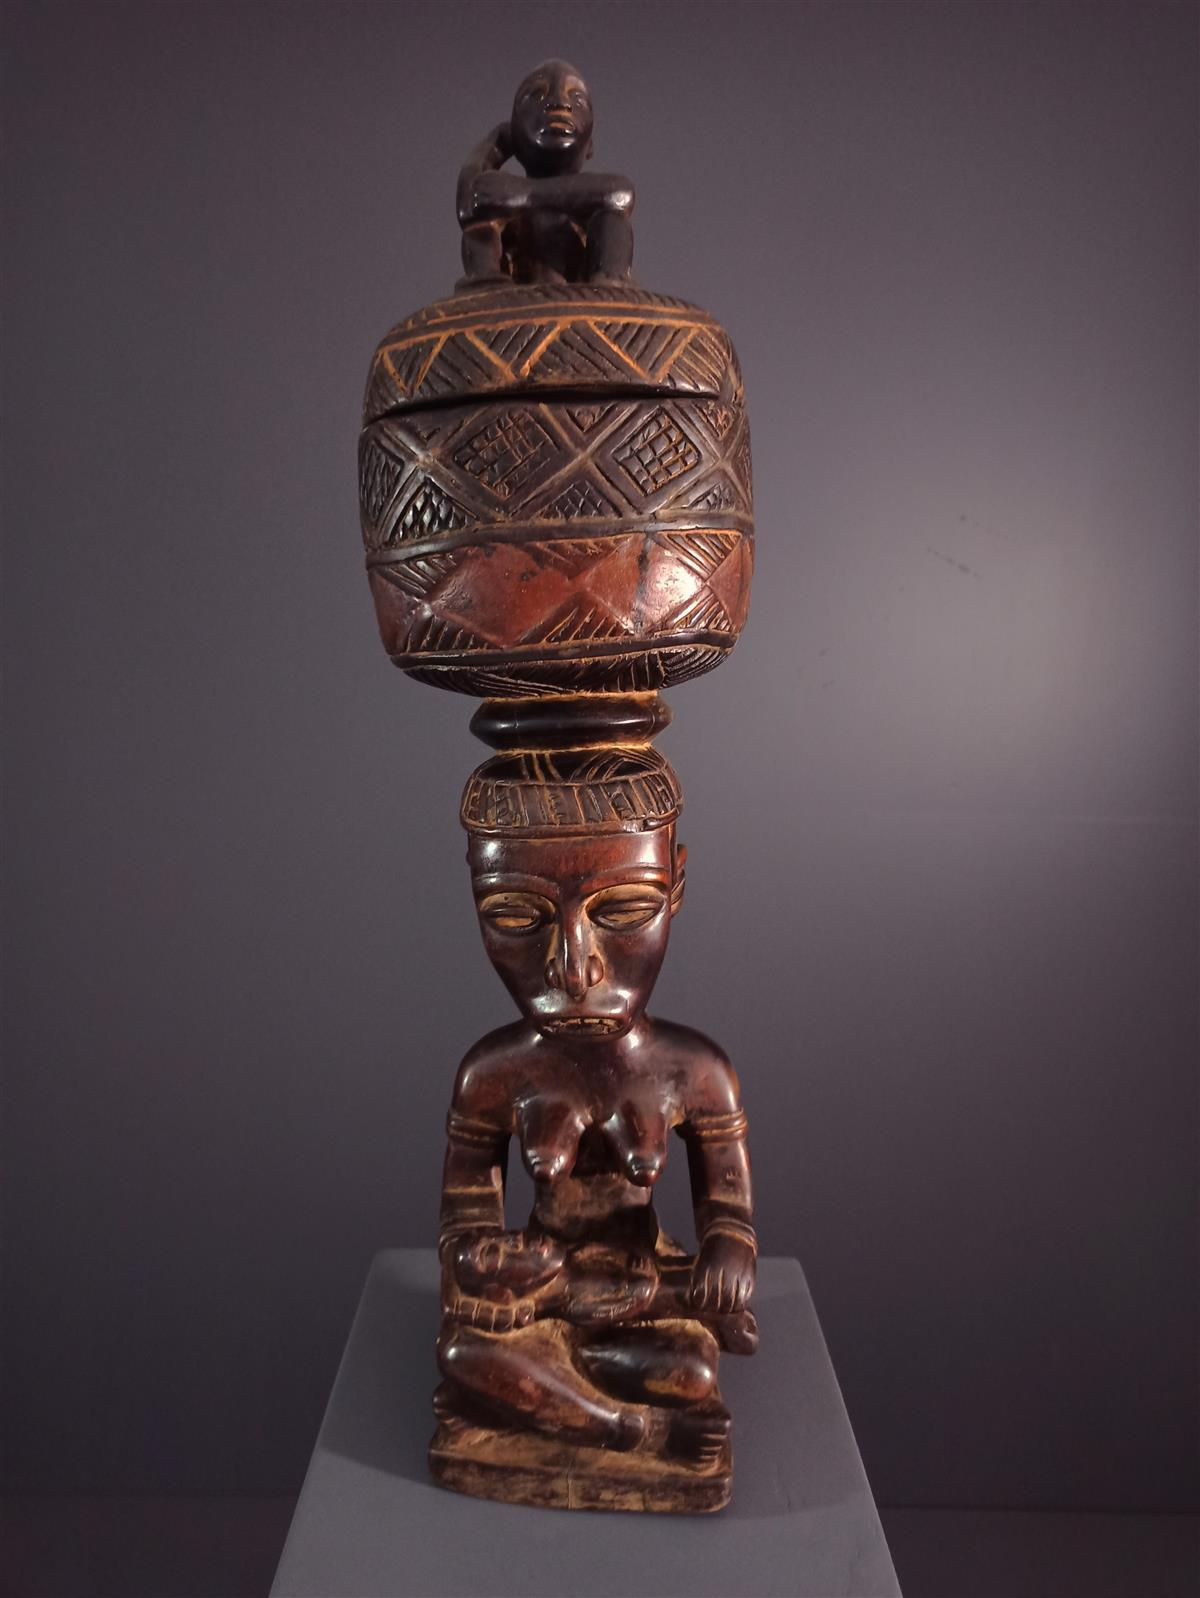 Kongo Box - African art